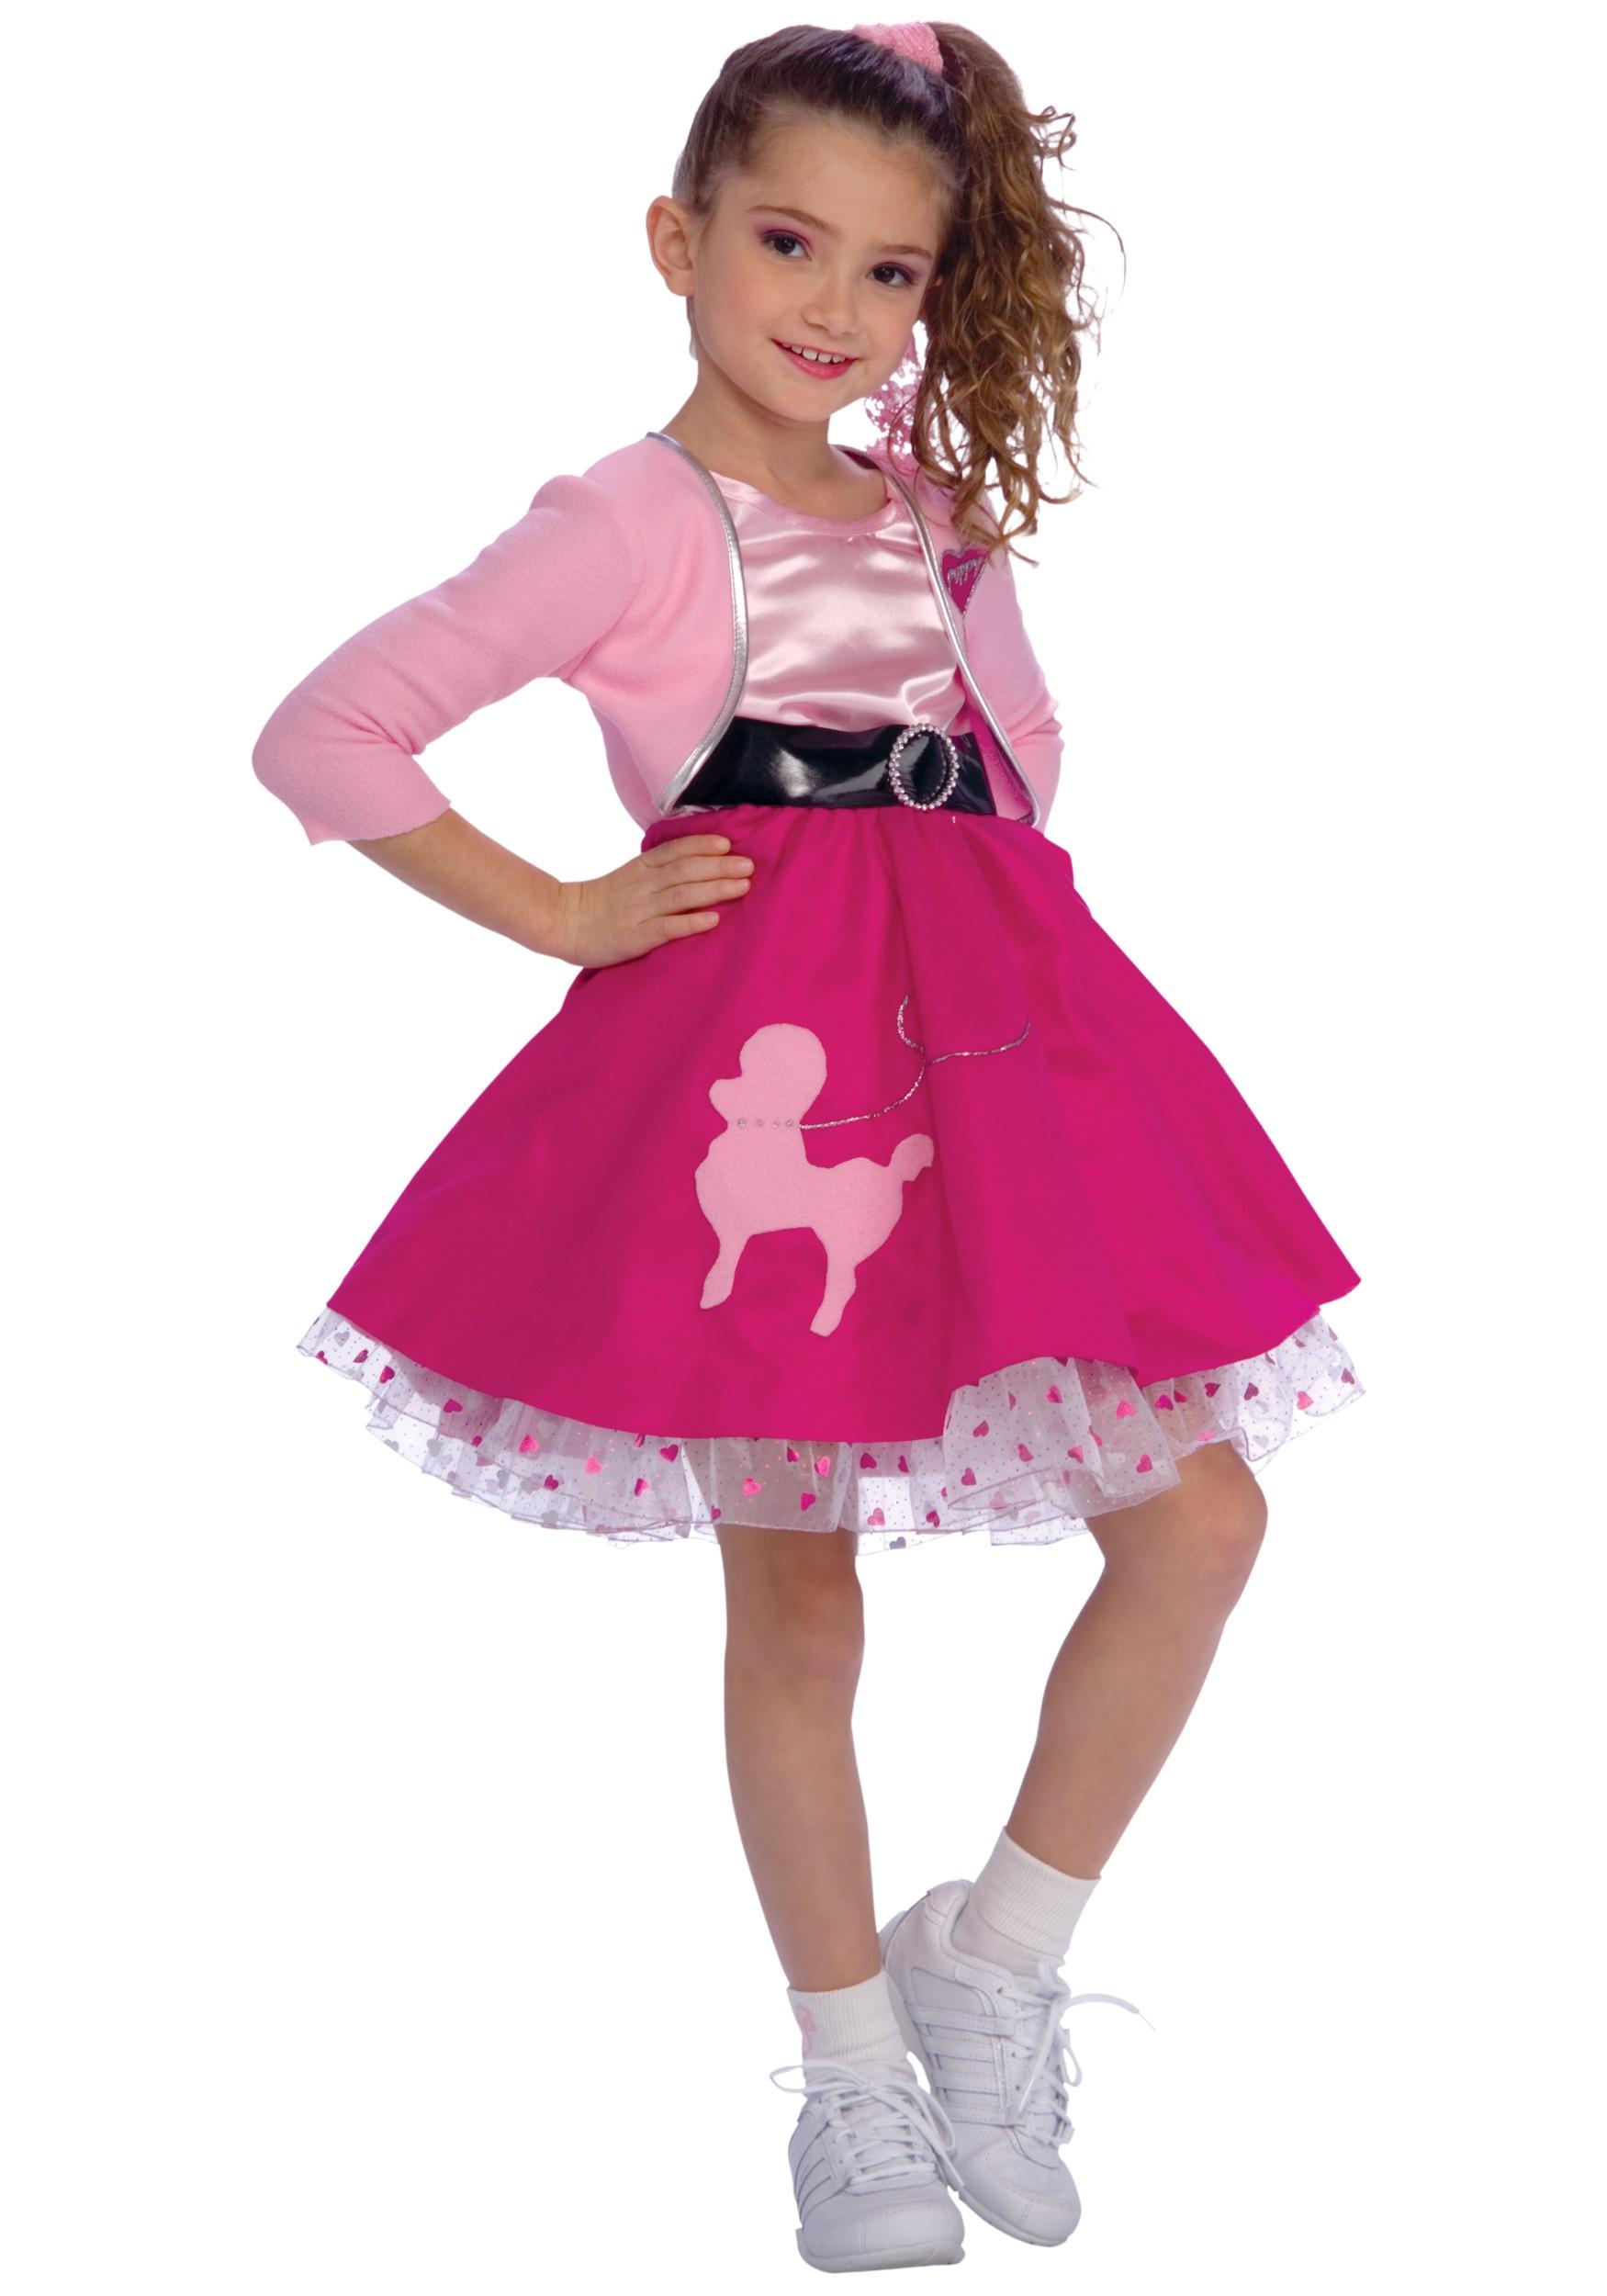 50s Dress Up   Cheap Poodle Skirts   50s Attire